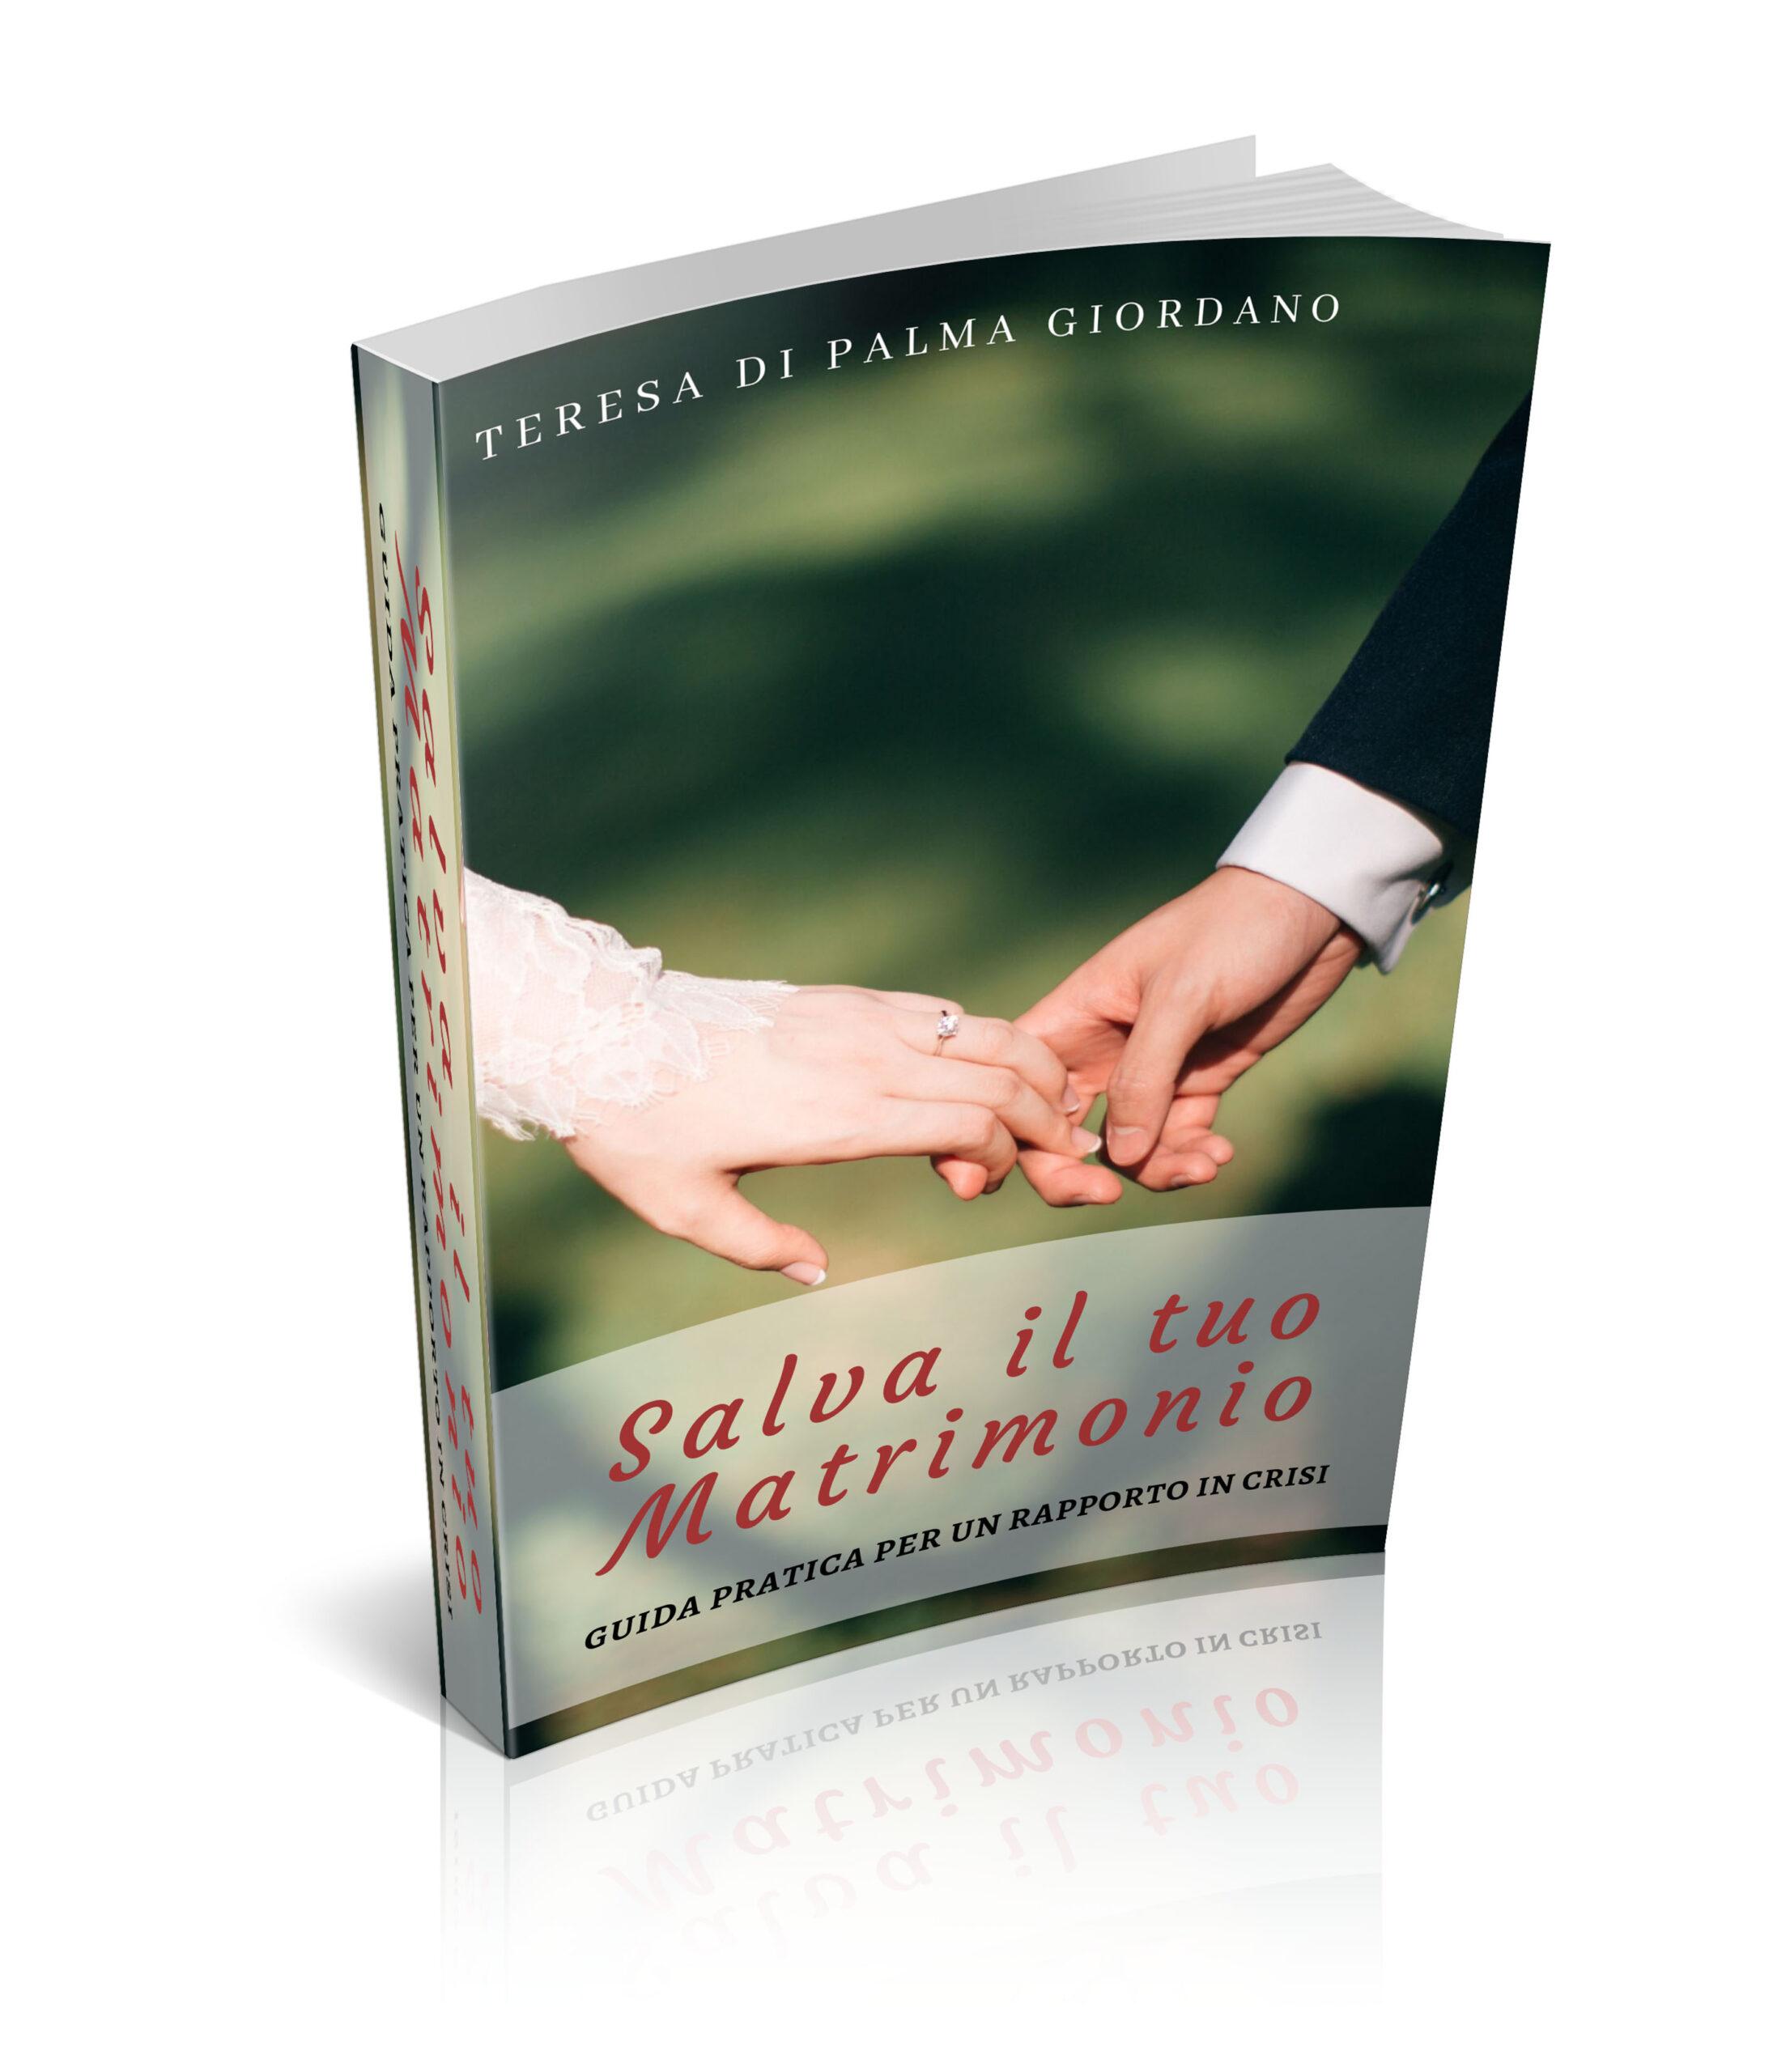 Salva il tuo matrimonio